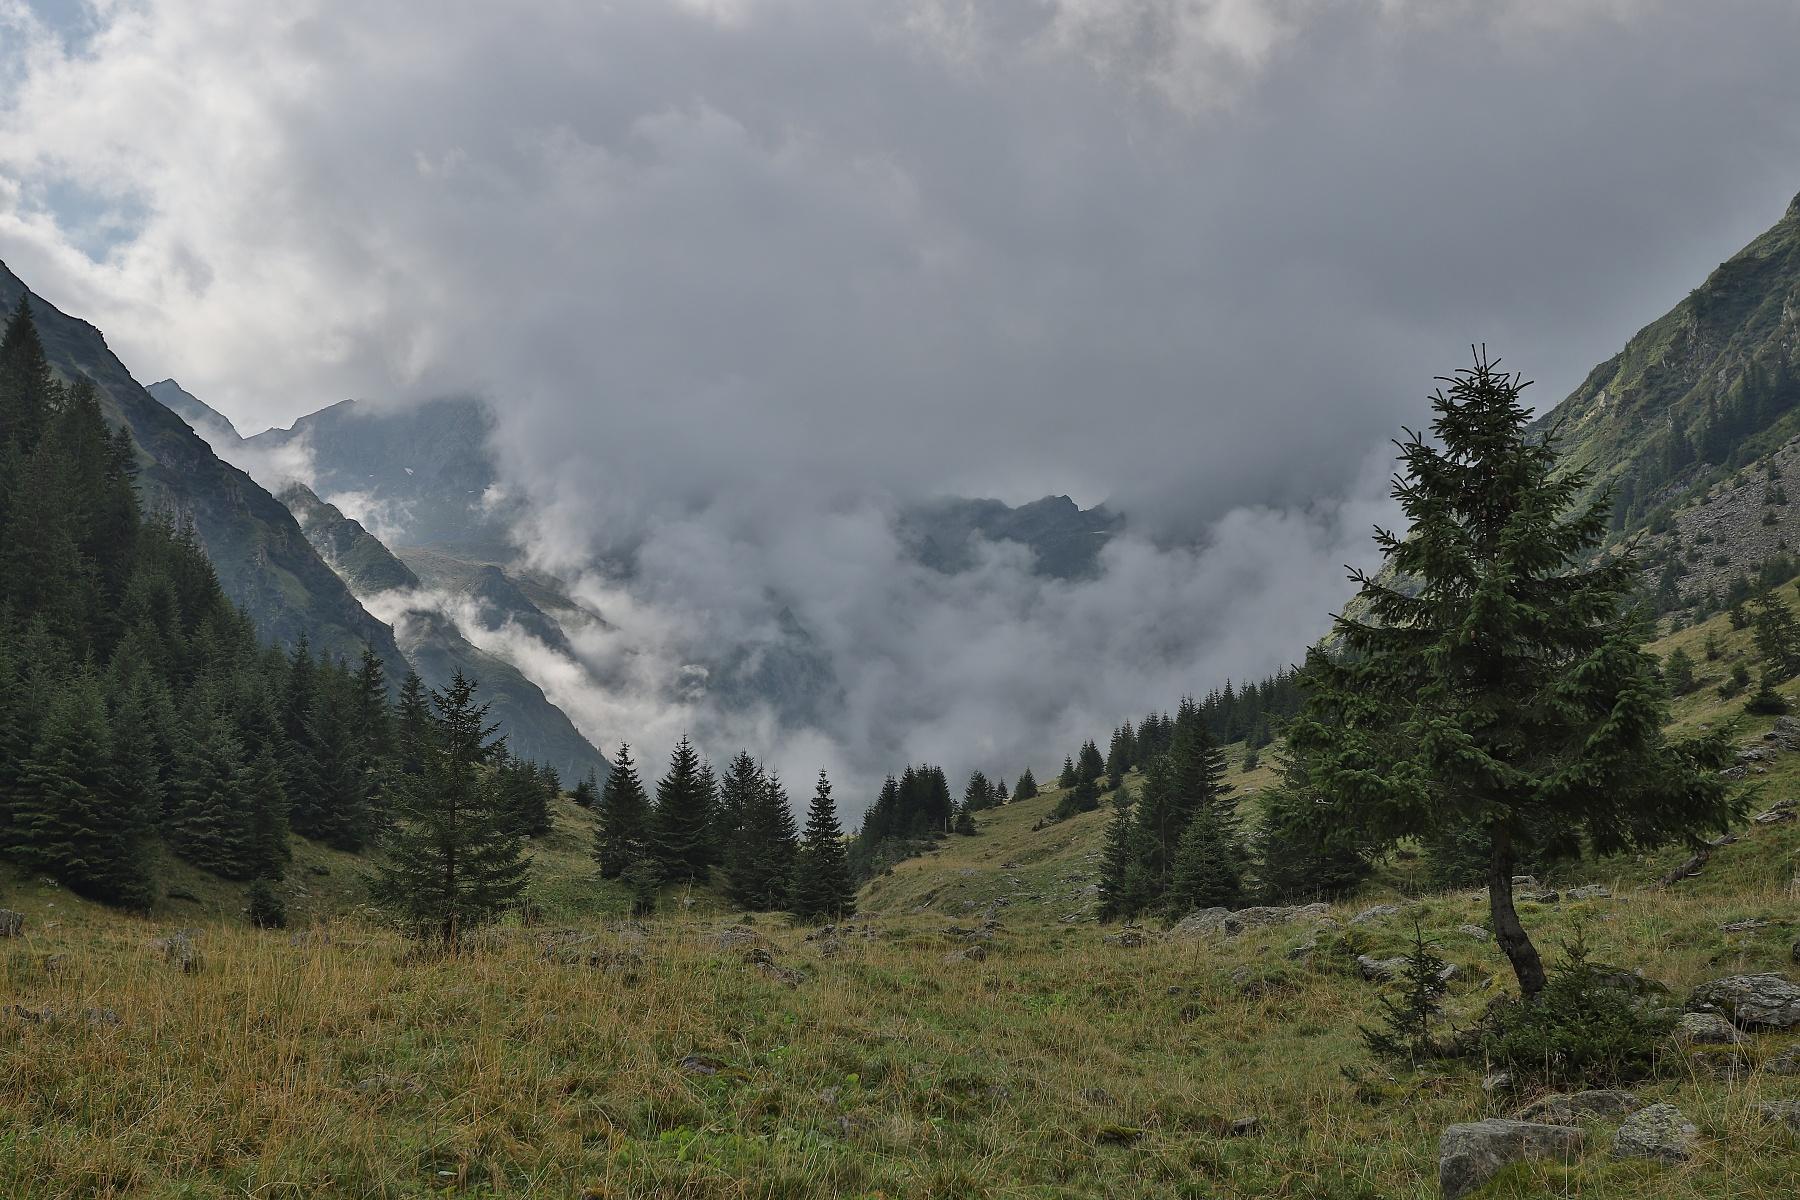 Valea Vistei, Munții Făgăraș, Romania Canon EOS 6D mark II, Canon 17-40 mm f4 L USM, 40mm, f6.3, 1_1250, ISO 250, HDR, 17. august 2019